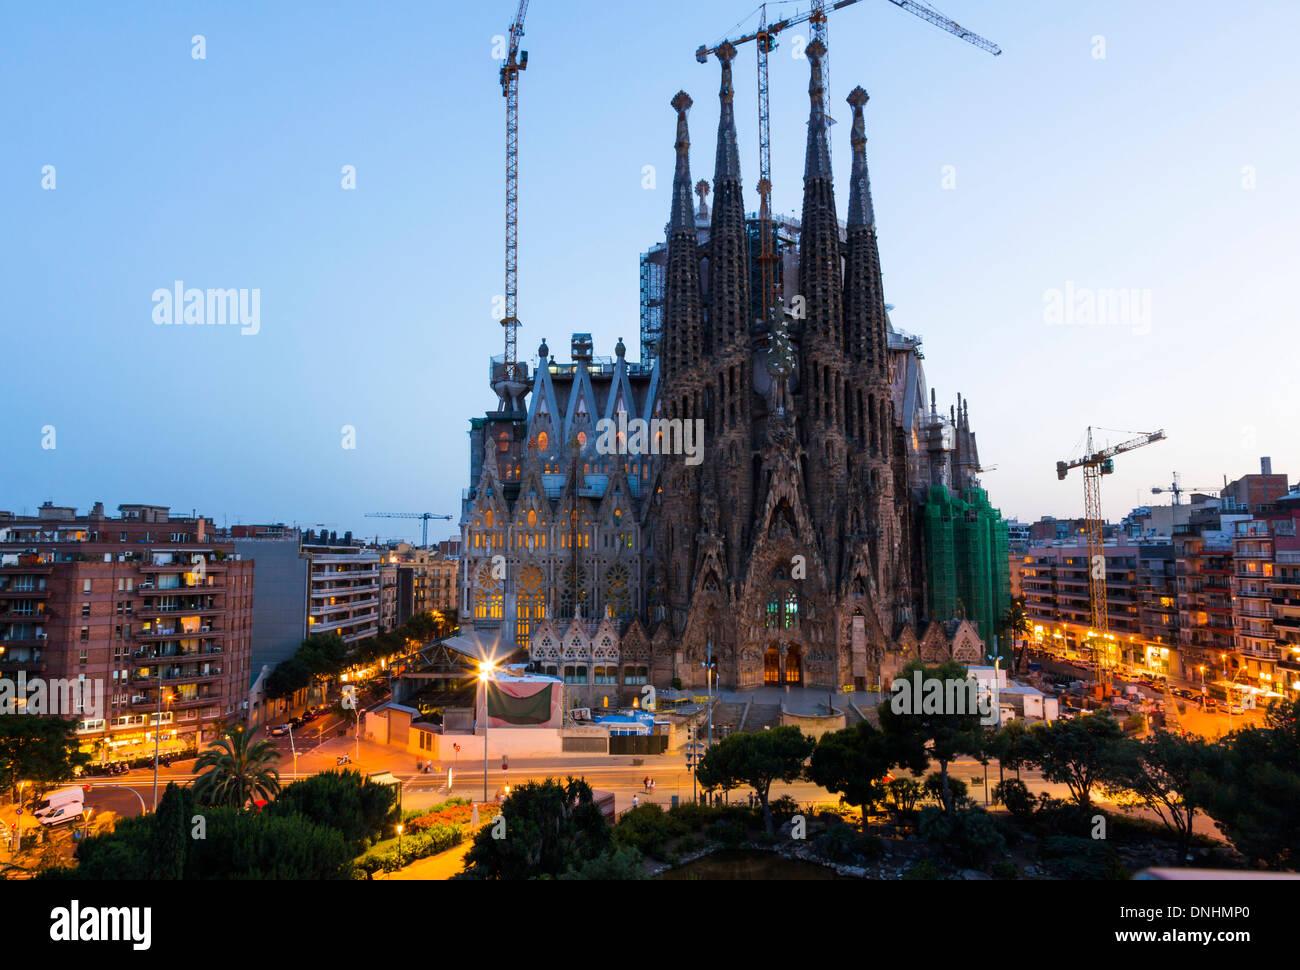 Church in a city, Sagrada Familia, Barcelona, Catalonia, Spain Stock Photo